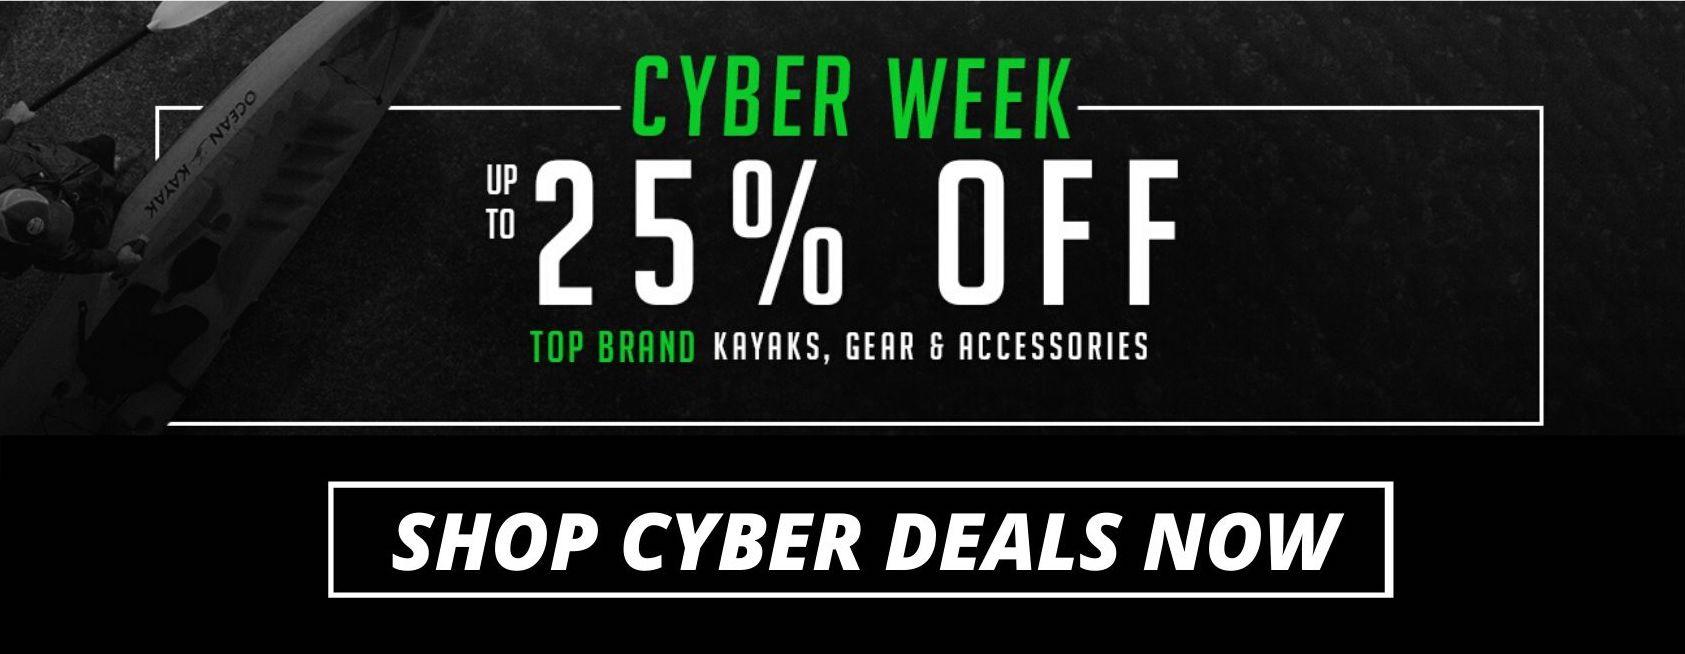 Shop Cyber Week Deals Now